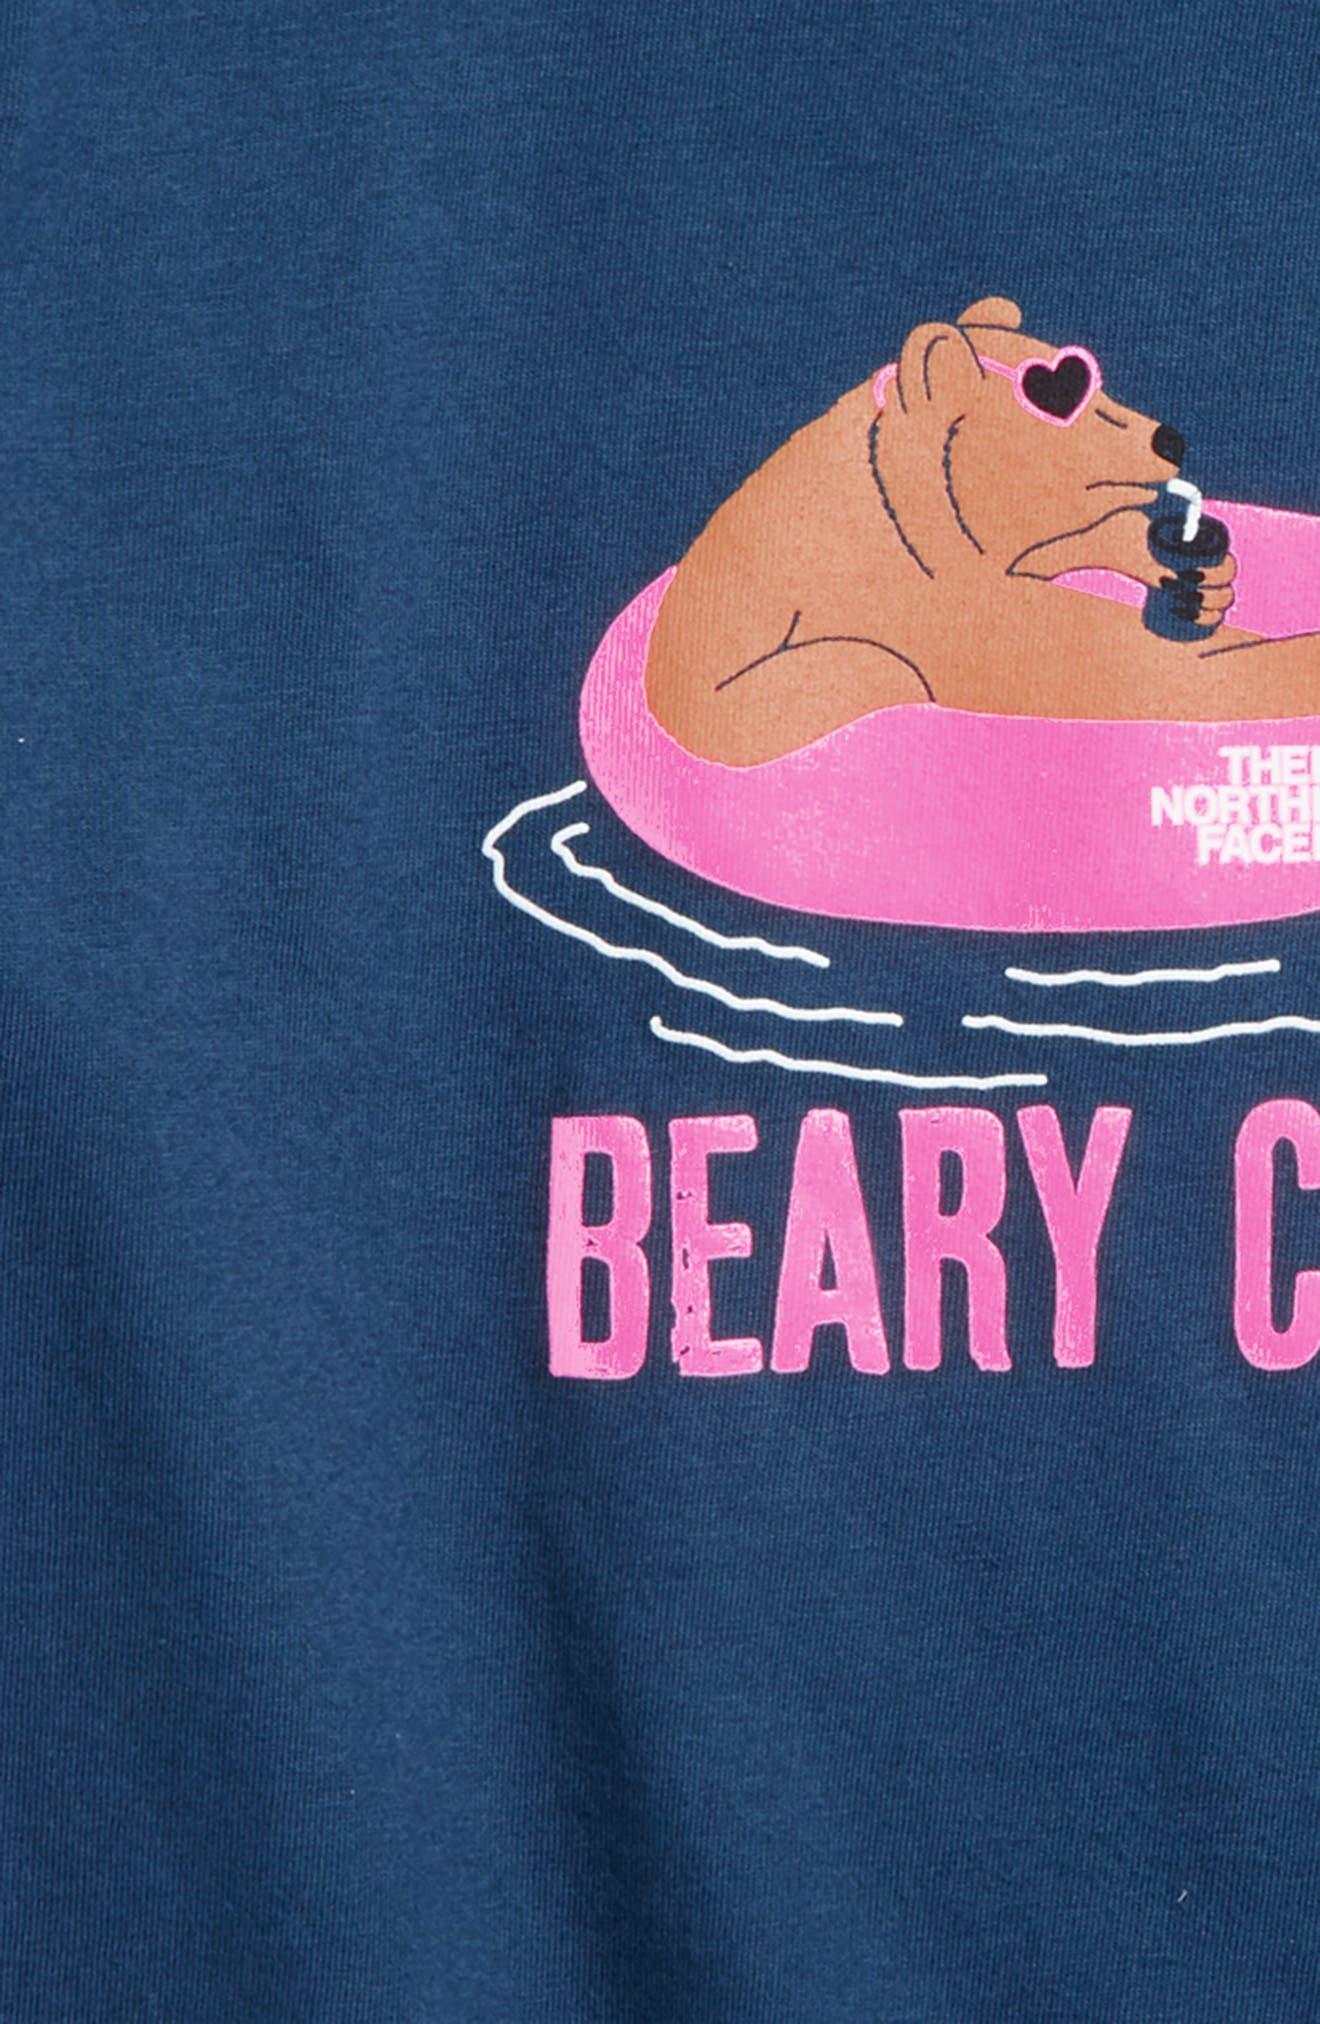 Beary Chill T-Shirt,                             Alternate thumbnail 2, color,                             441